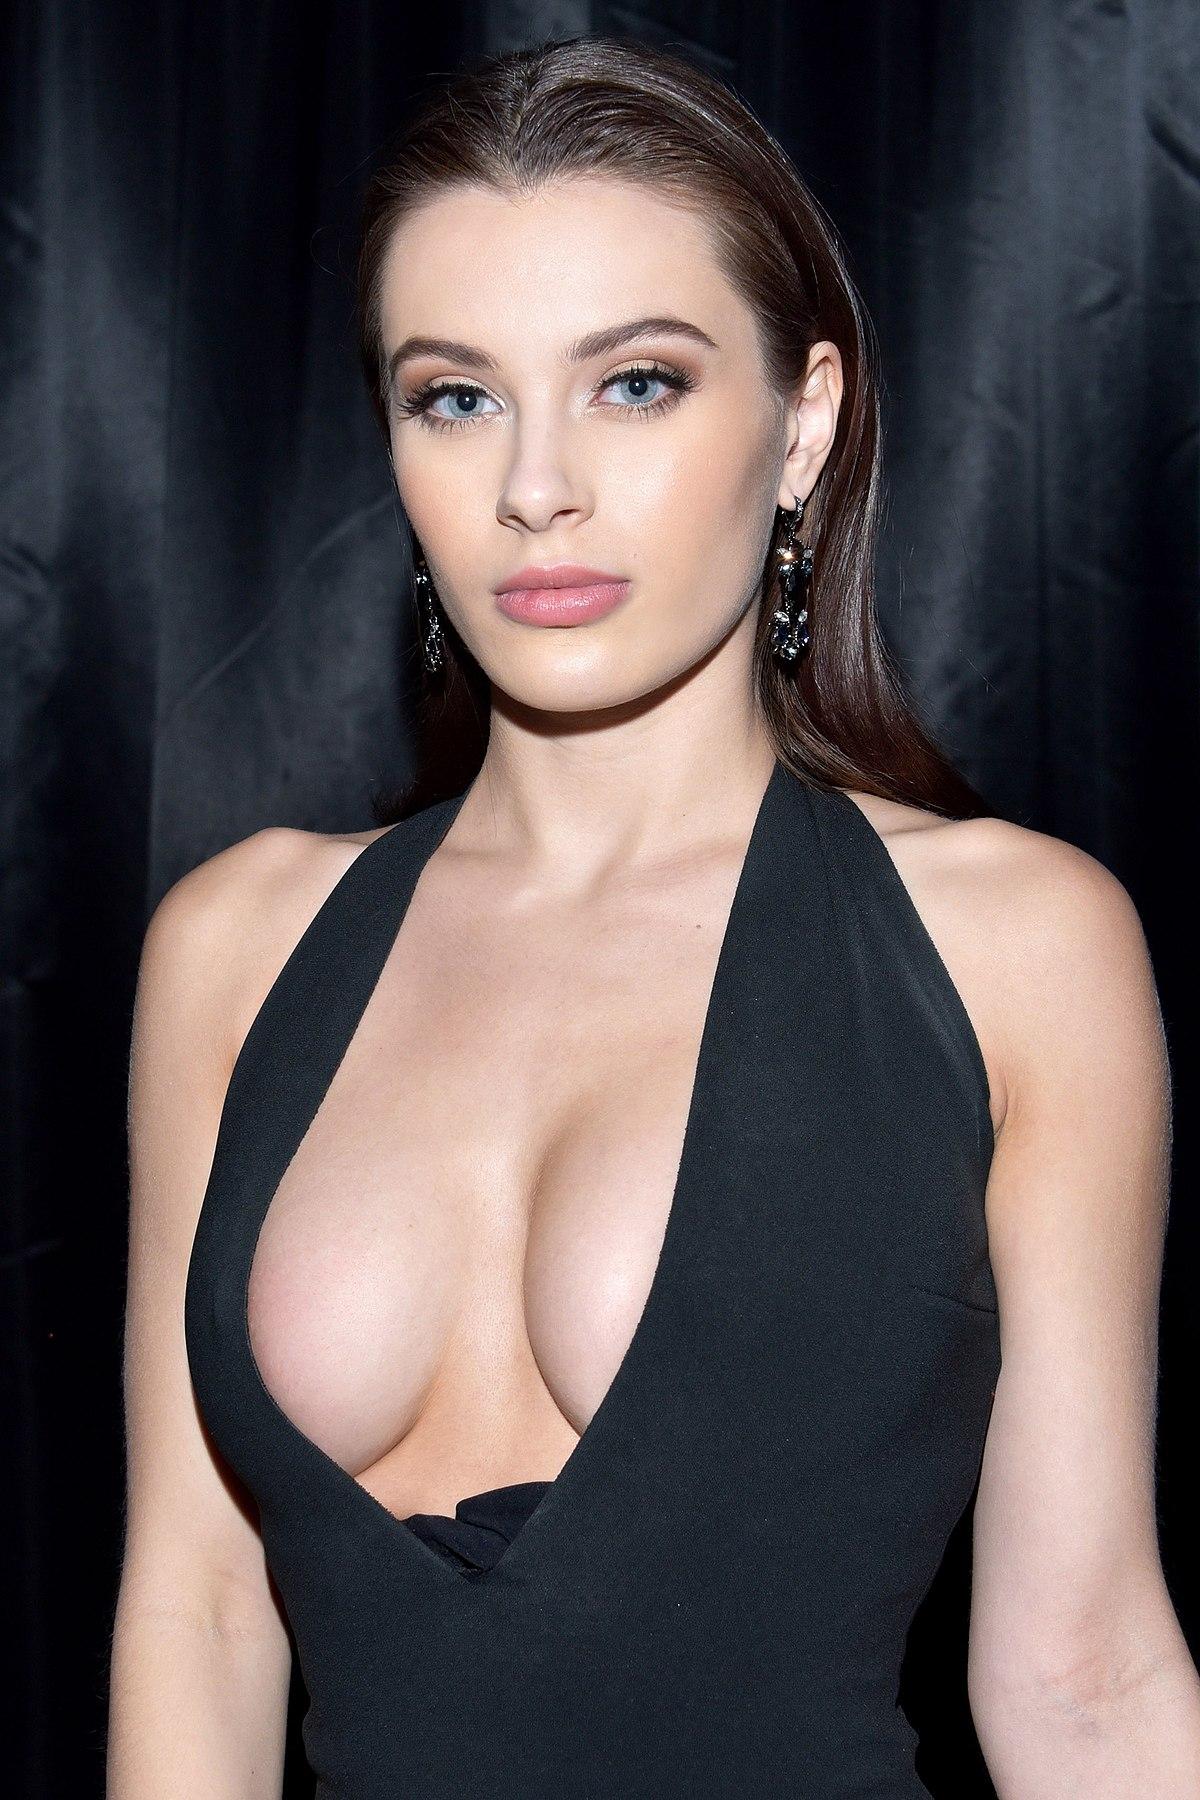 nudes of girls vaginas